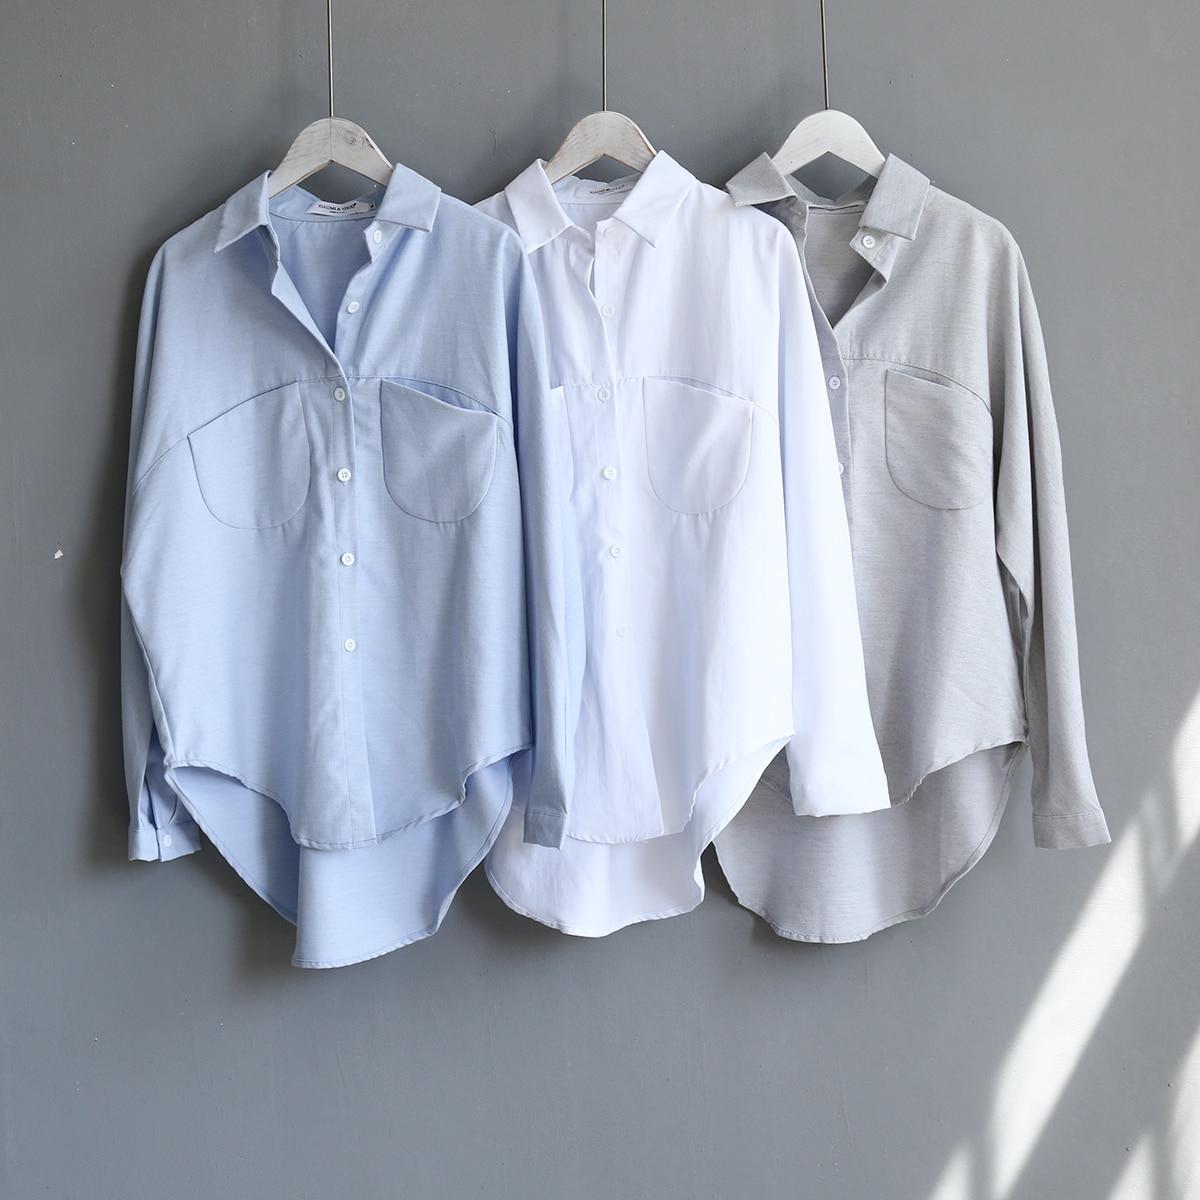 Blouse Korean Long Sleeve Tops And Blouses Vintage Women Shirts 6